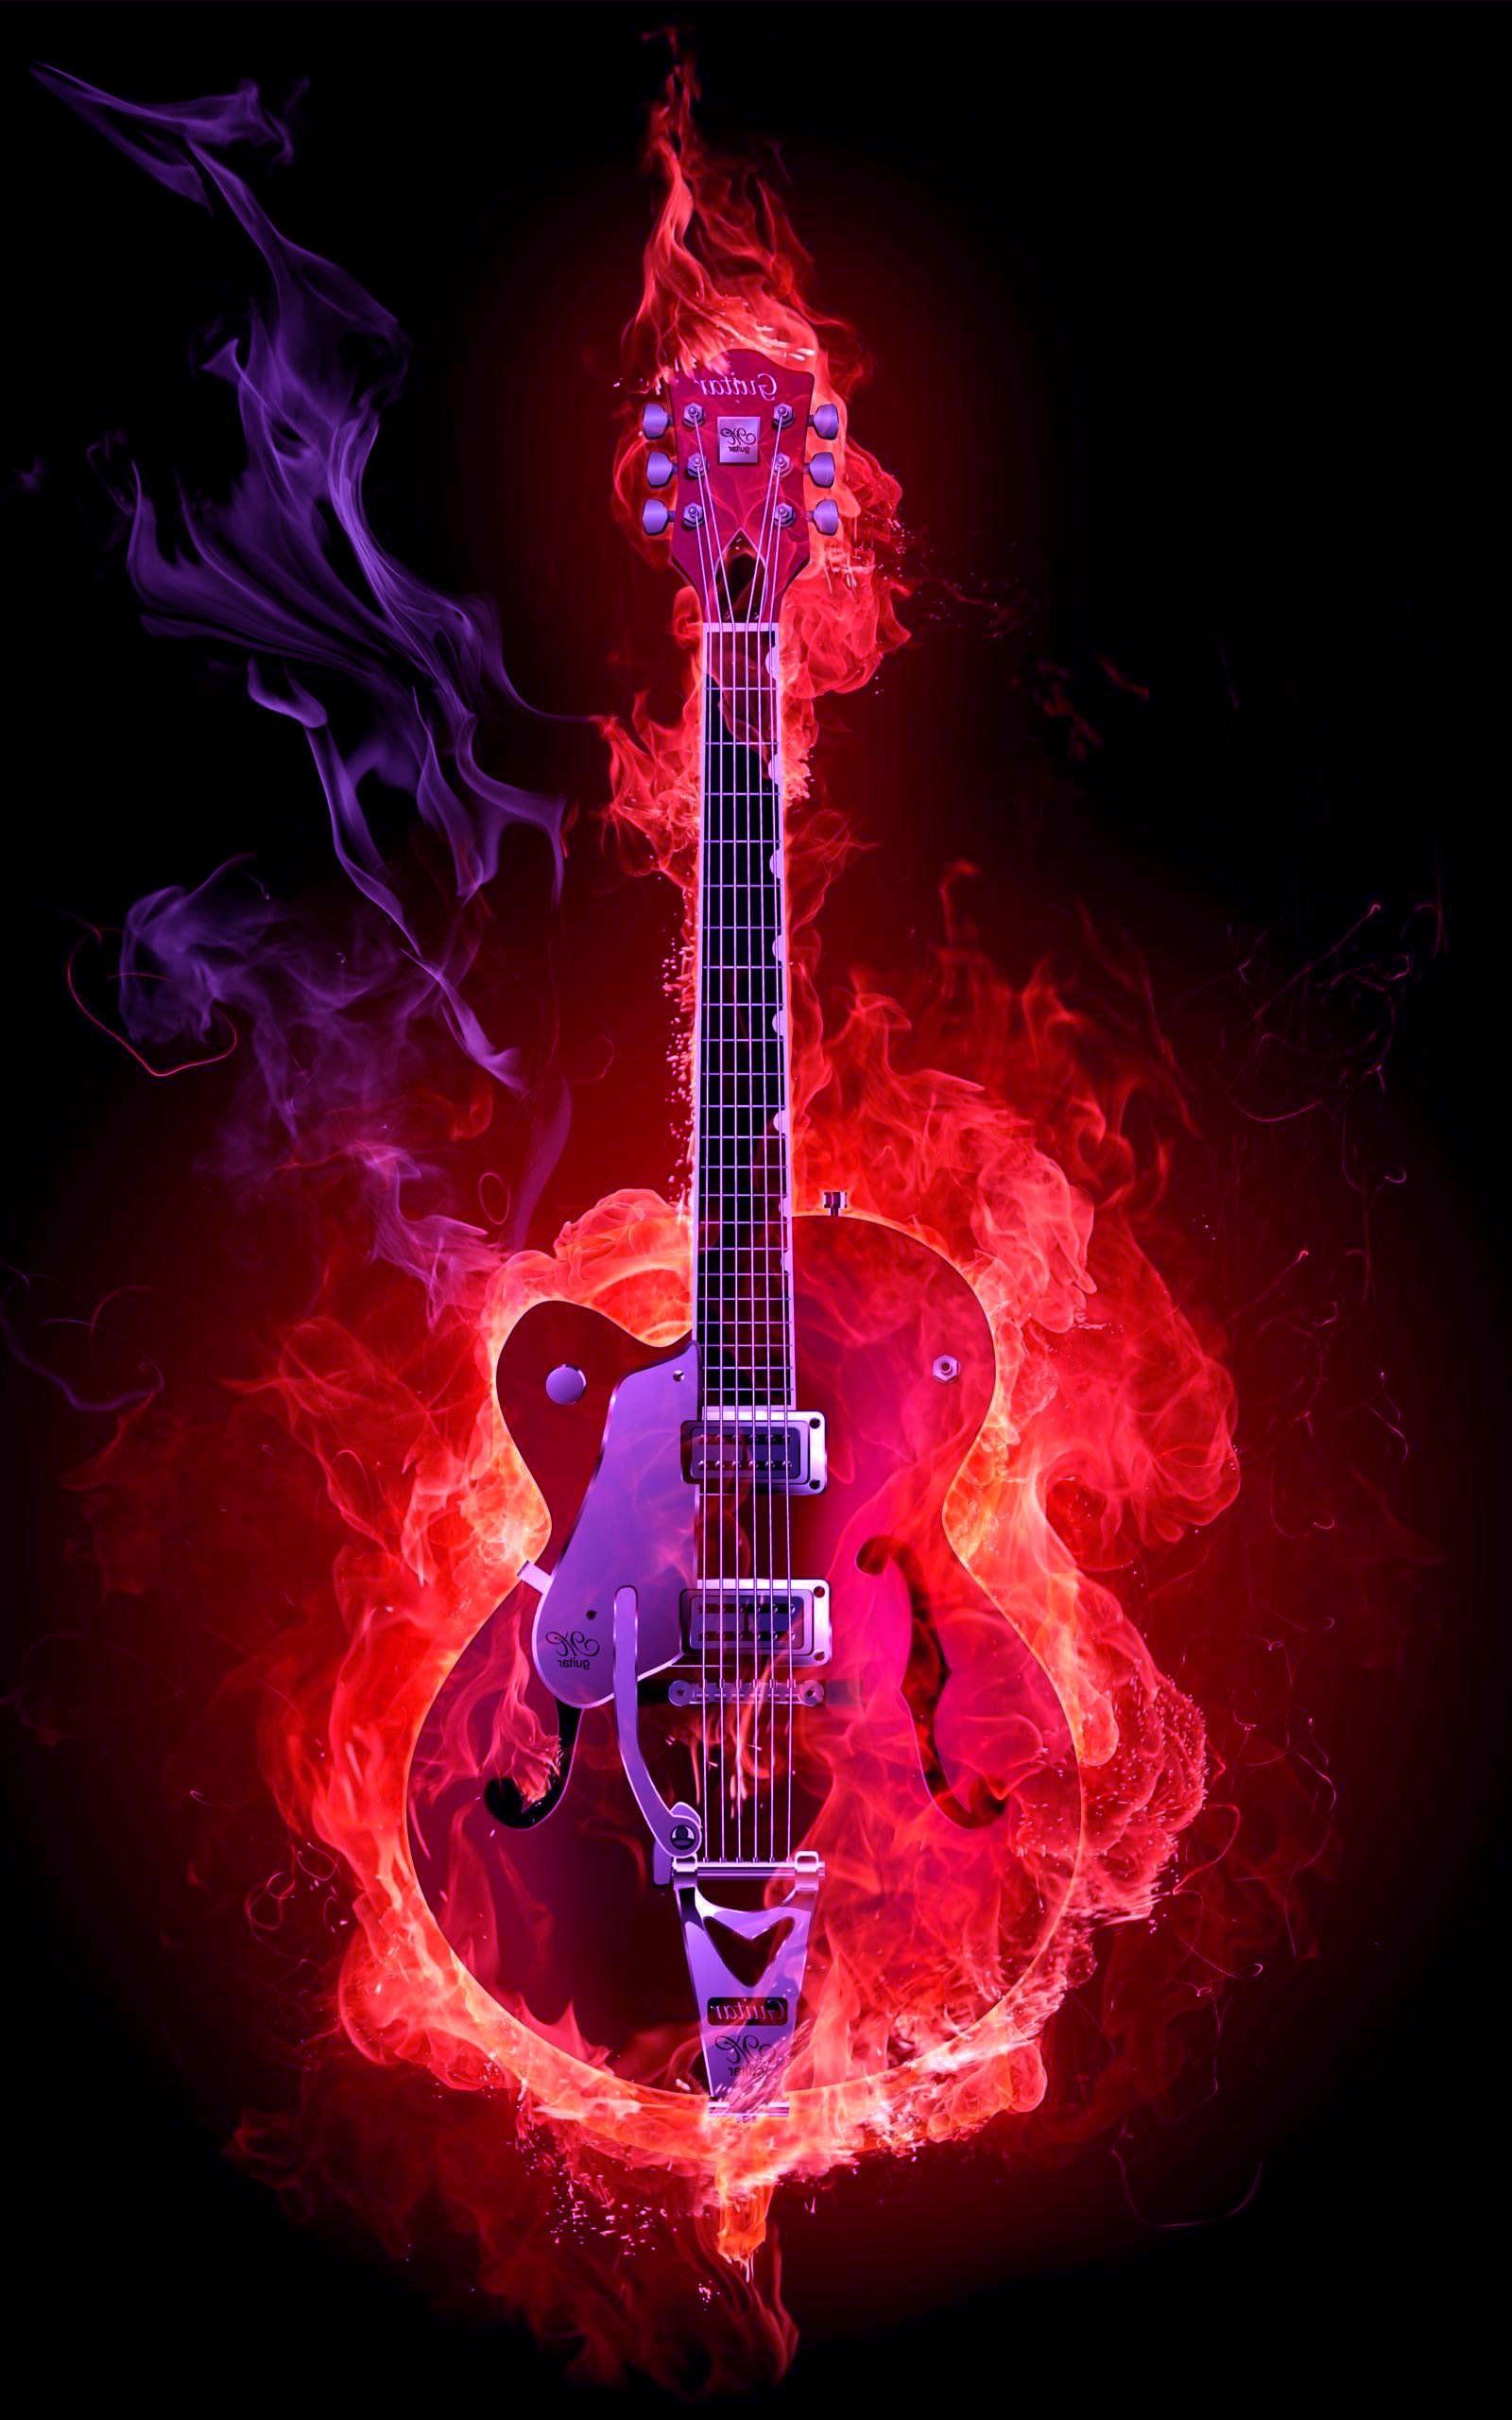 55 Colorful Guitar Wallpapers Download At Wallpaperbro Guitar Wallpaper Iphone Music Wallpaper Hd Wallpaper